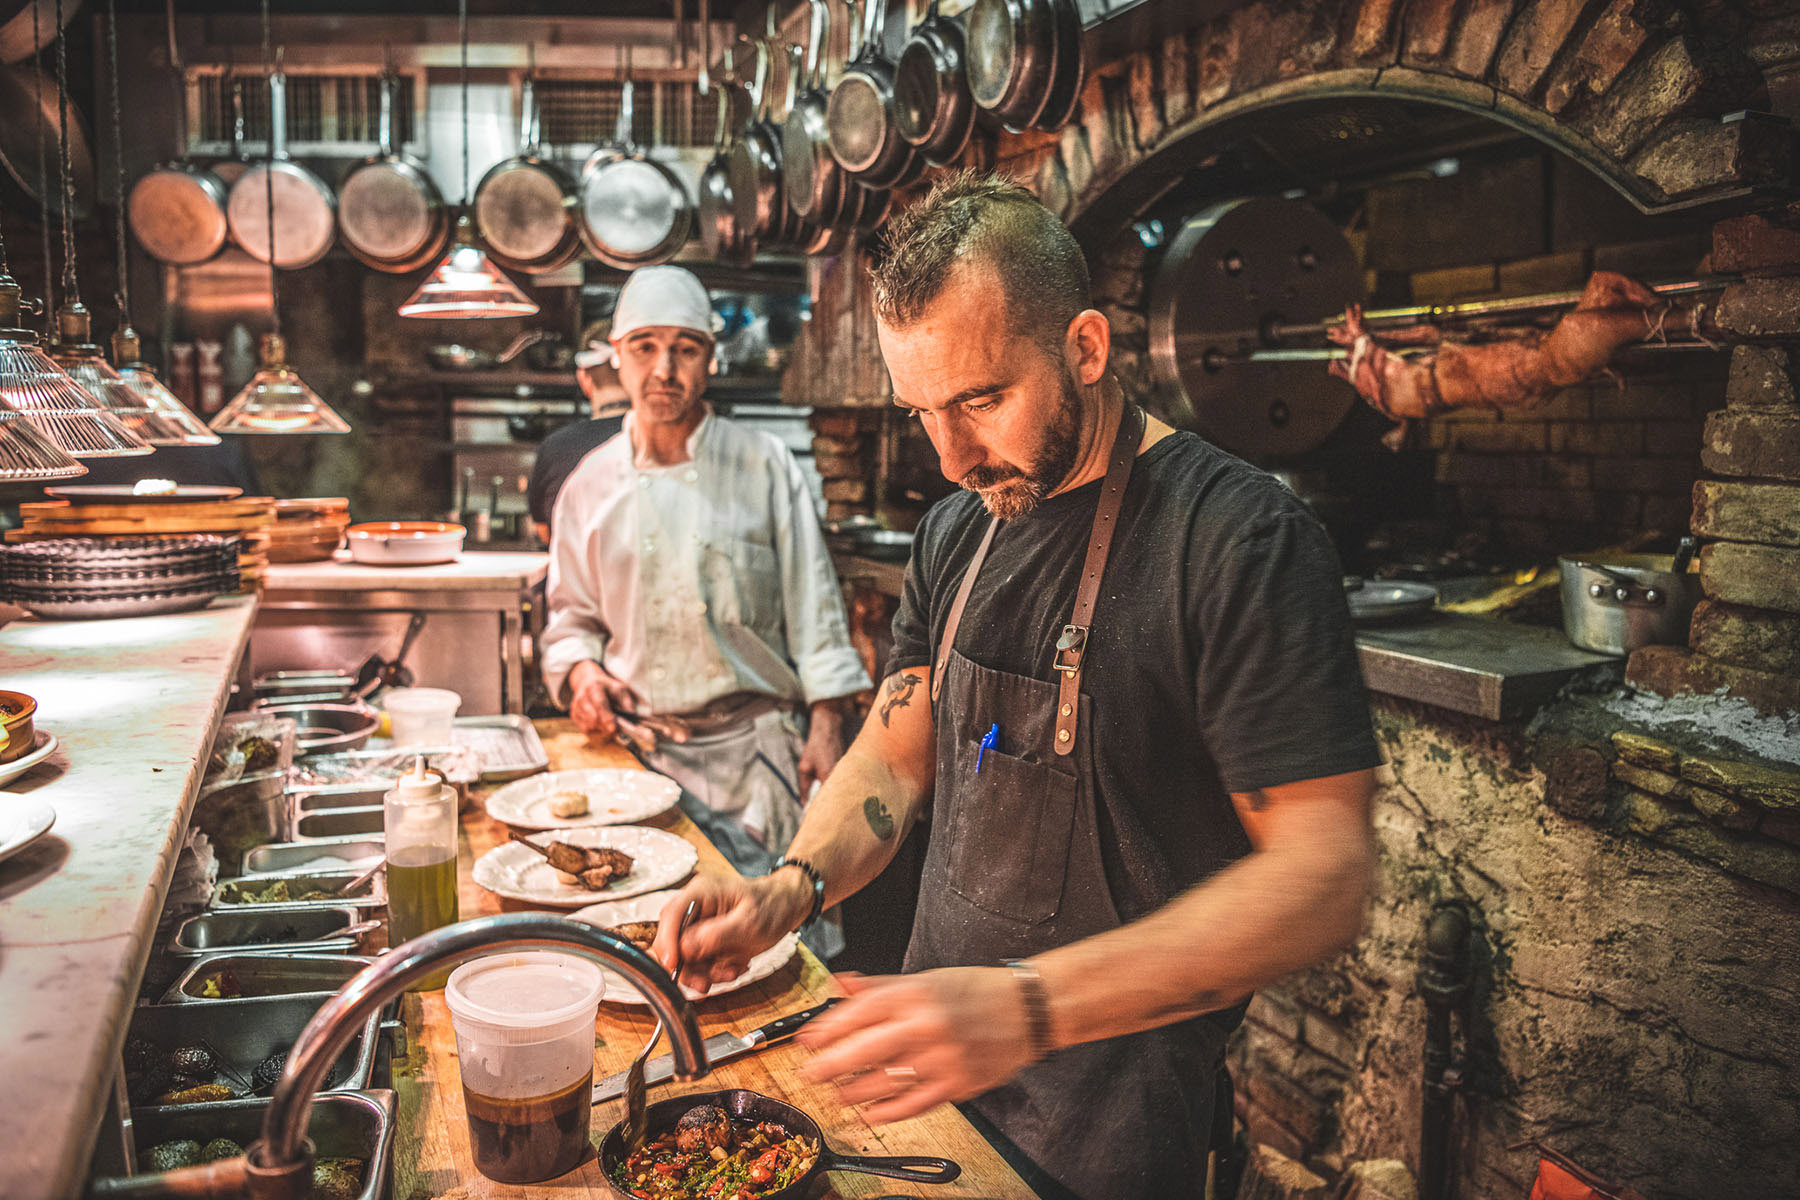 Marc Forgione: Marc Forgione & Peasant Restaurant